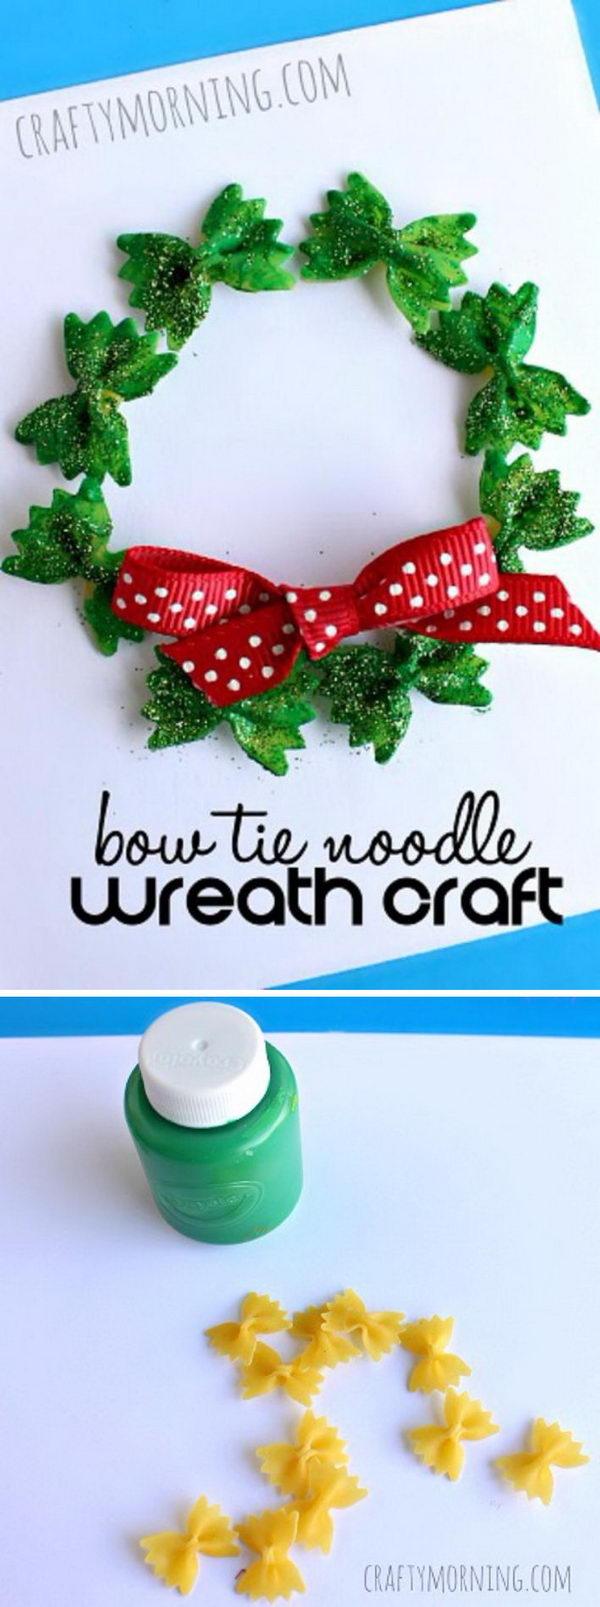 Bow Tie Noodle Wreath Craft.